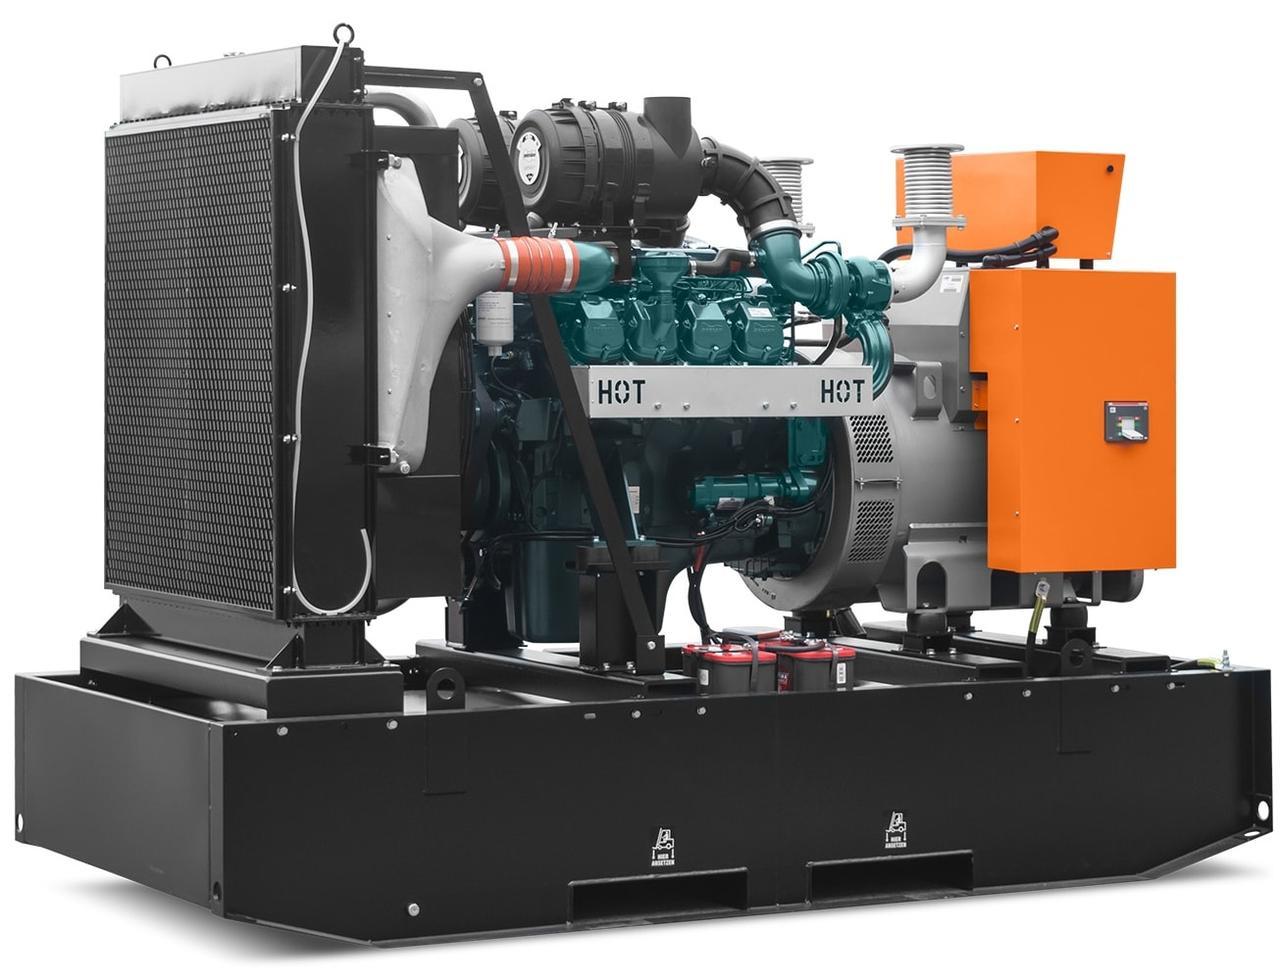 RID 600 C-SERIES (480 кВт)